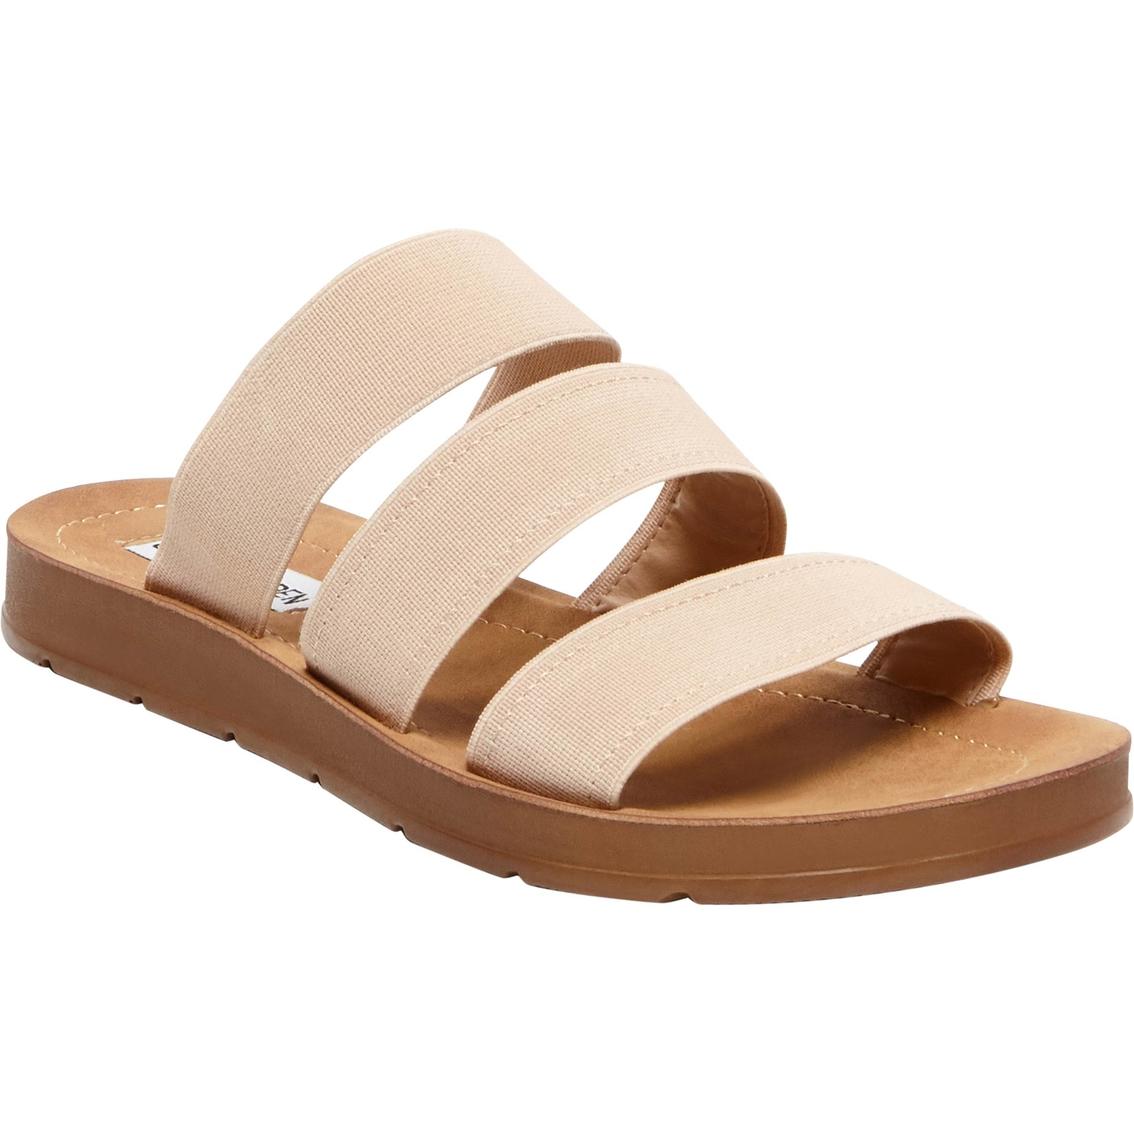 7abd8f1f36 Steve Madden Women's Pascale Three Band Flat Sandals | Flats | Shoes ...